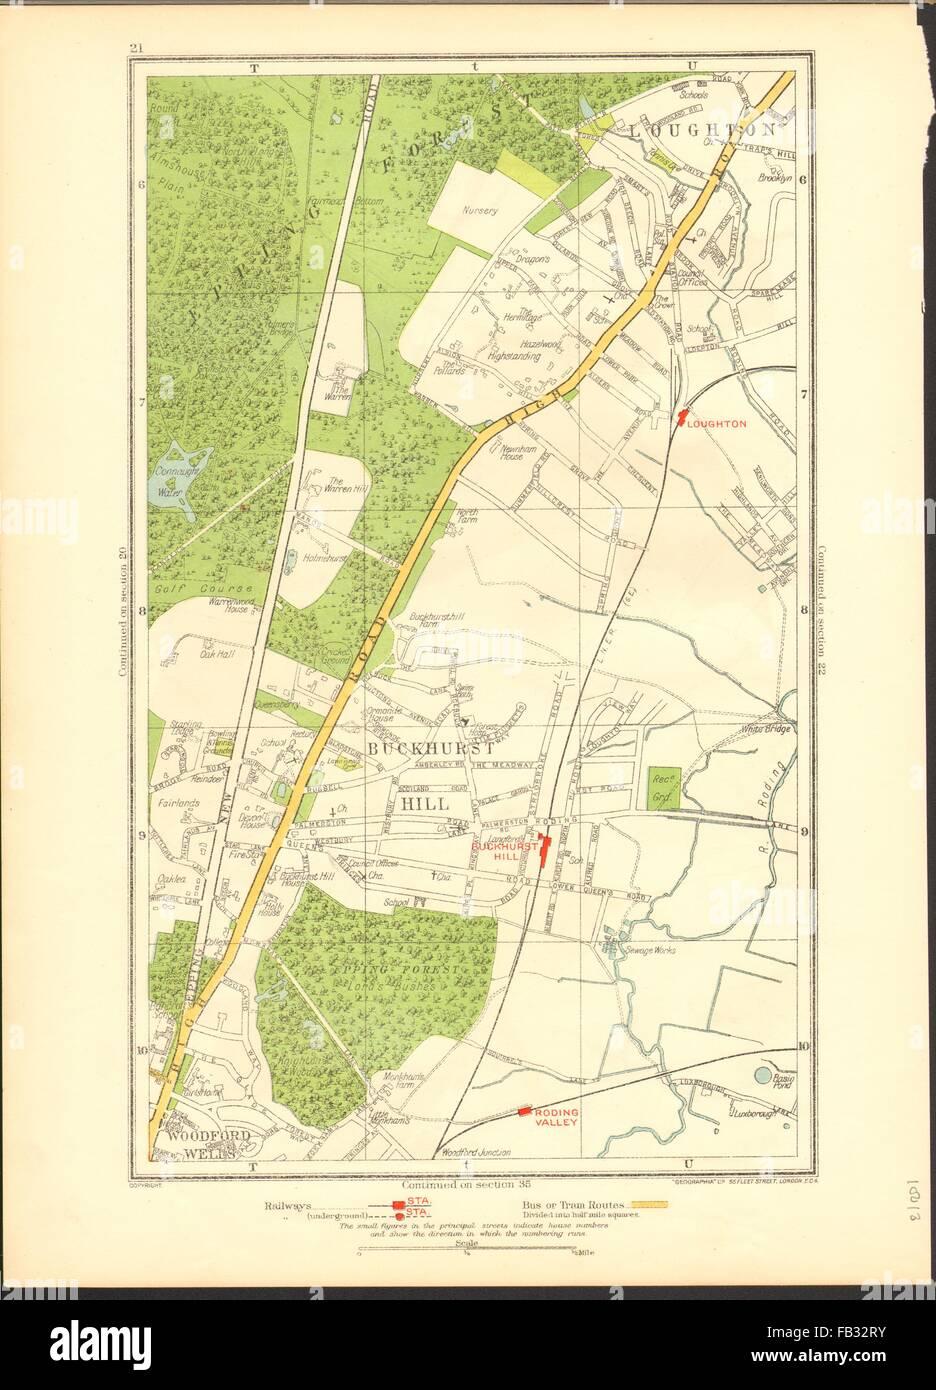 Essex Art Prints Buckhurst Hill Loughton Woodford Wells Roding Valley 1937 Old Map